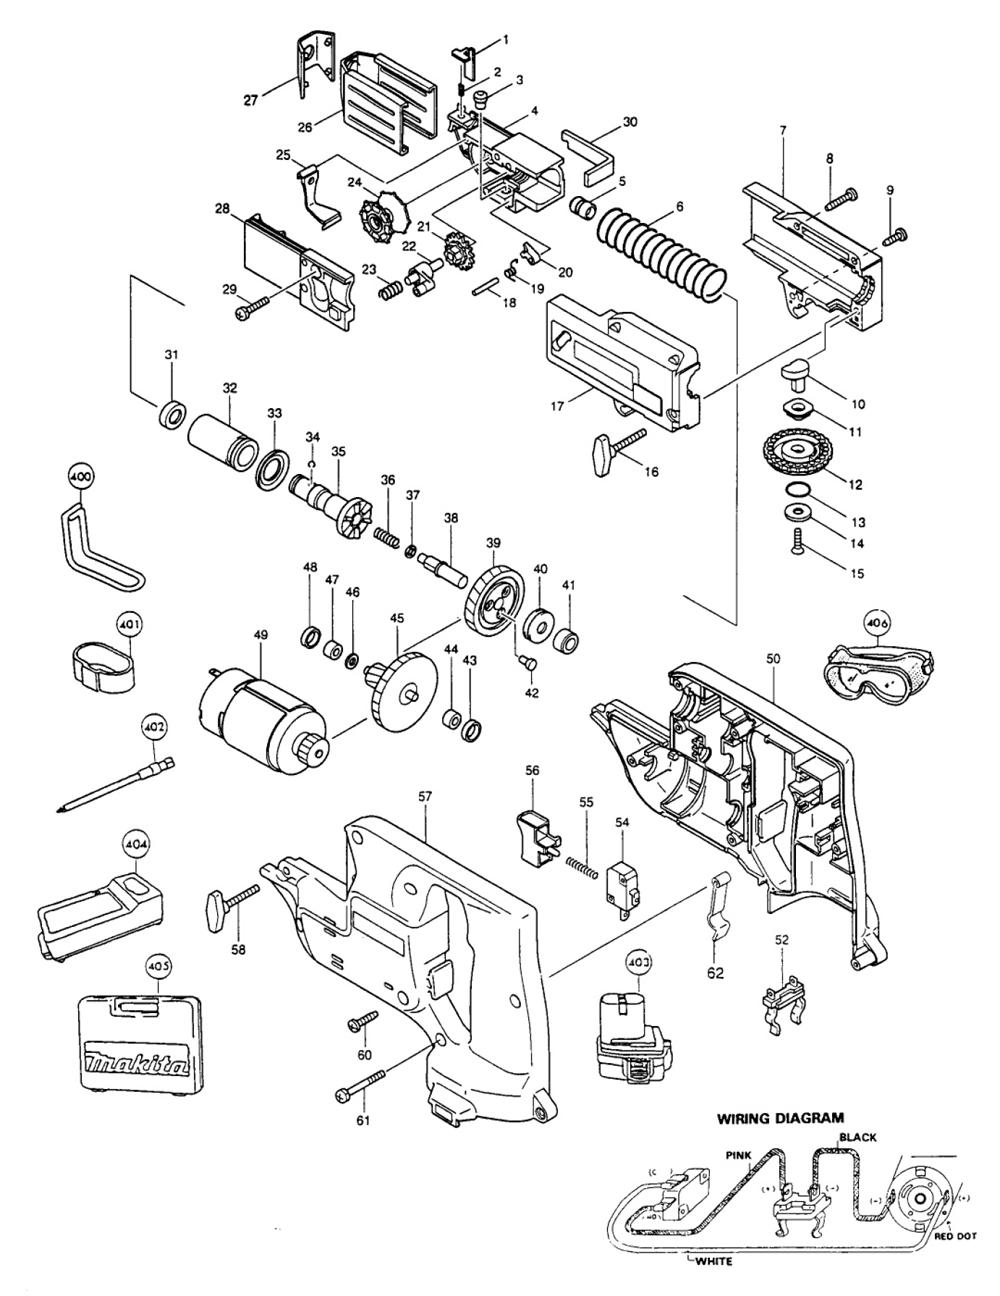 makita 9227c wiring diagram best wiring library 3-Way Wiring Diagram makita 6835dwa parts list makita 6835dwa repair parts oem parts makita 9227c parts cordless makita parts makita 9227c wiring diagram wiring